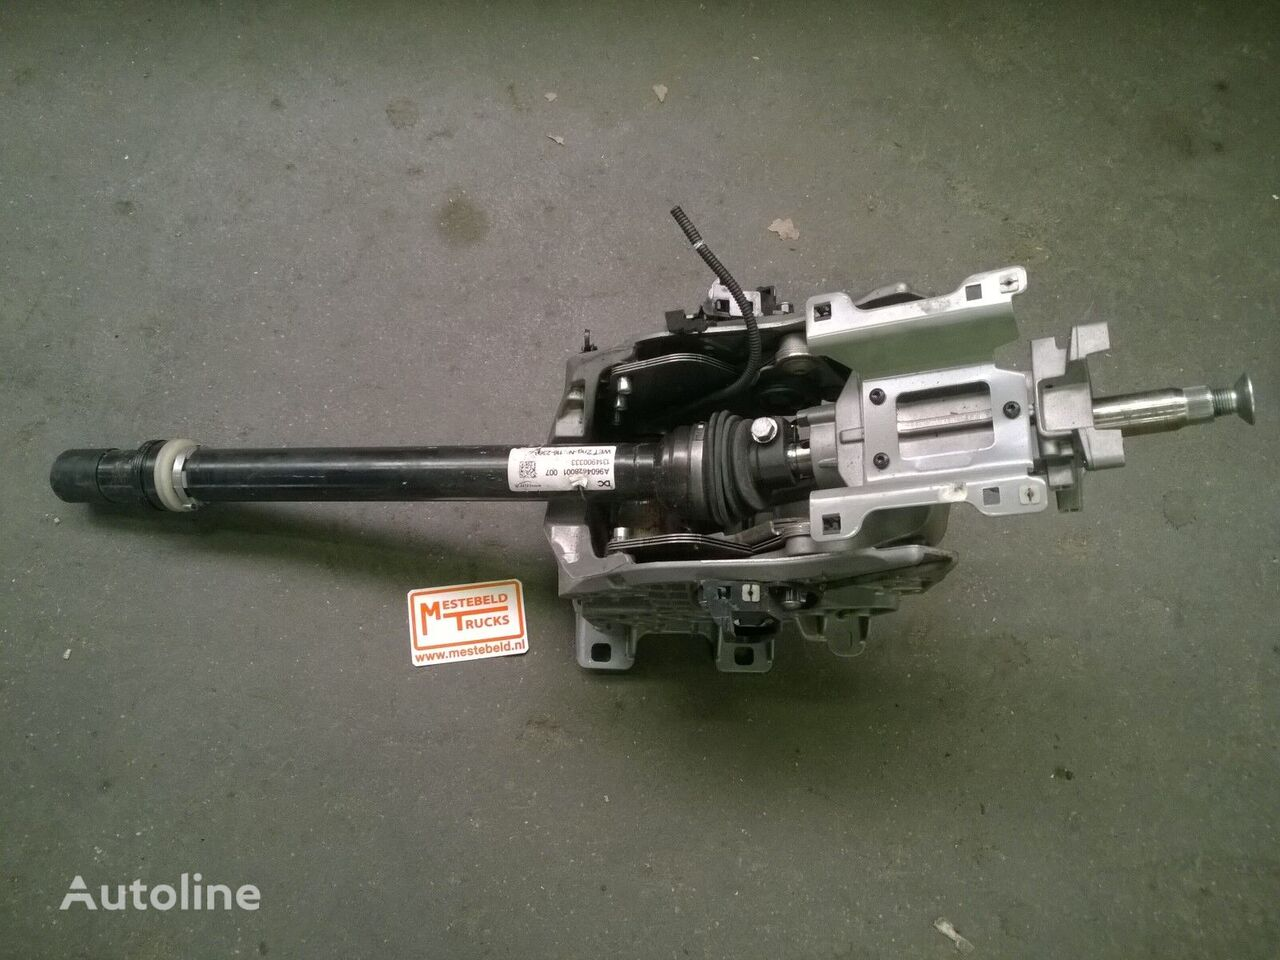 MERCEDES-BENZ Stuurkolom MP4 kamyon için Stuurkolom direksiyon kutusu